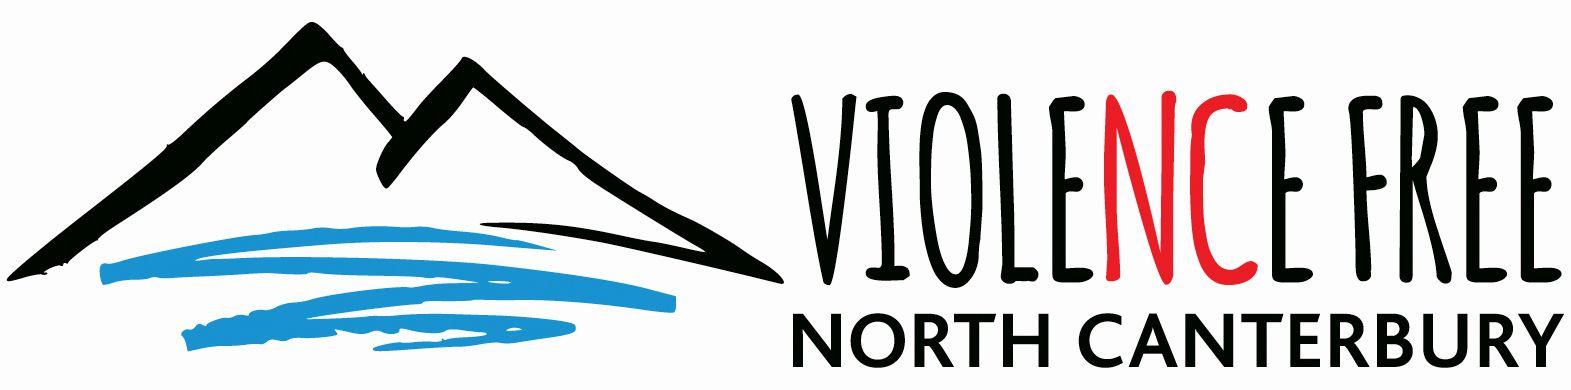 violence free north canterbury logo